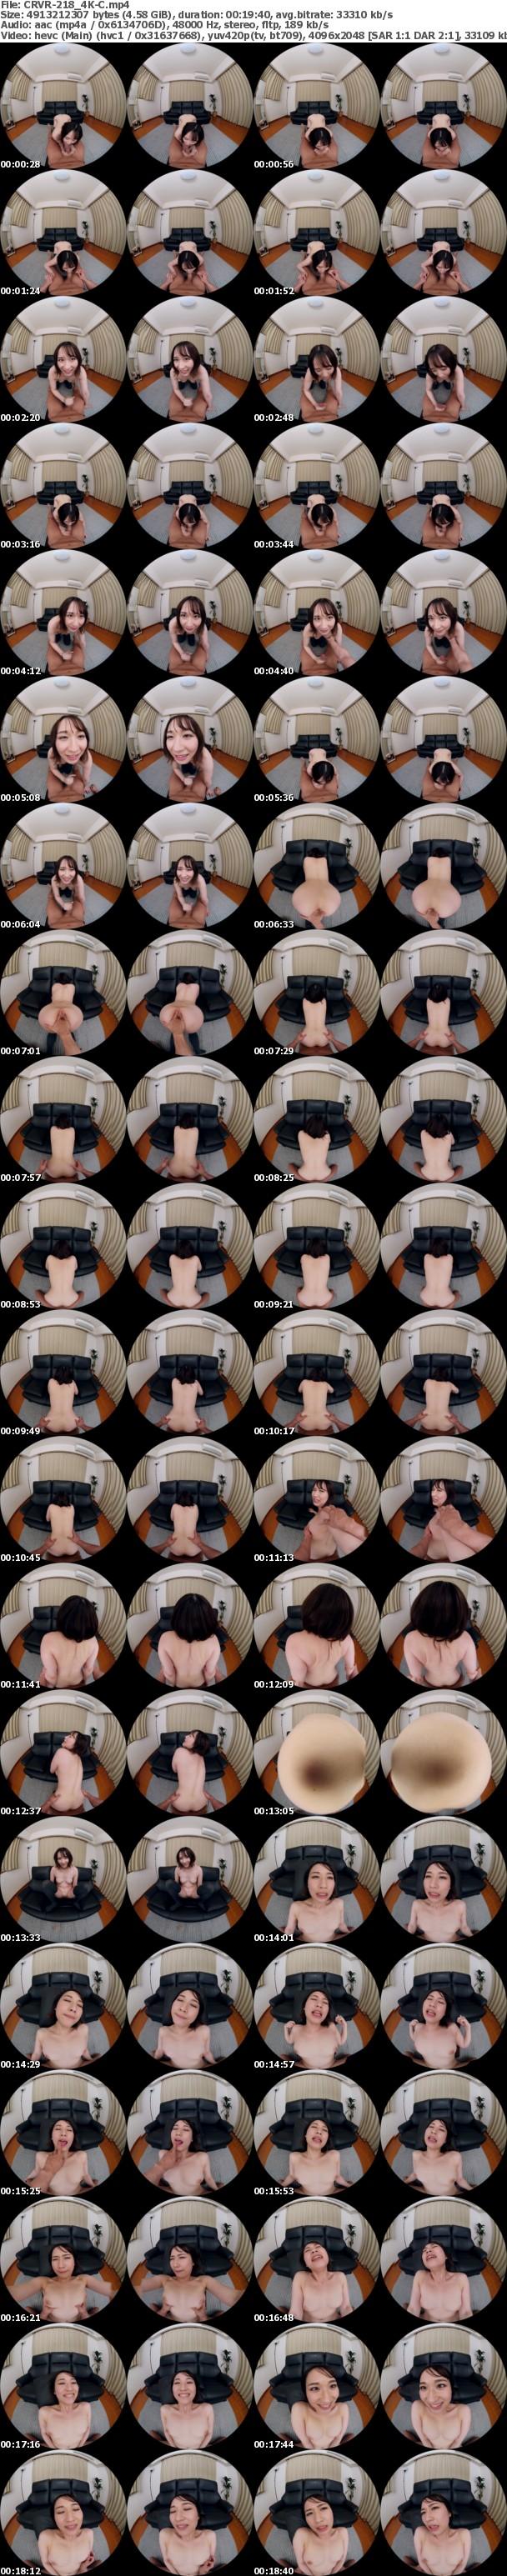 (VR) (4K) CRVR-218【4K匠】成海美雨 この色白美女とこれからSEXします。鏡に映るフェラ中のお尻は必見!後輩ちゃんに中出し三回!